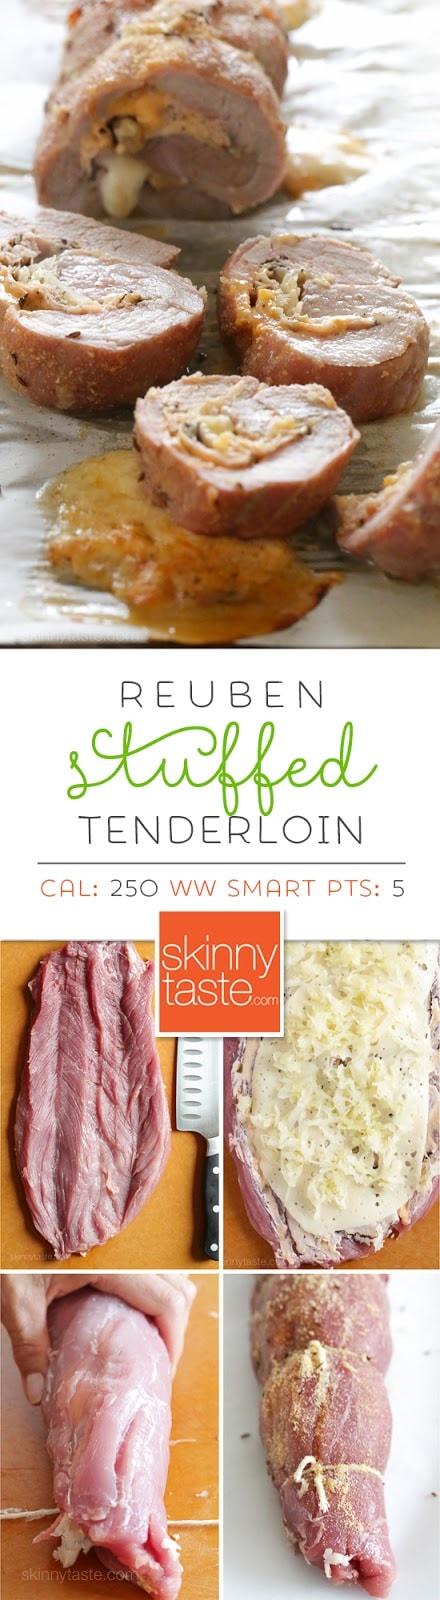 Rueben Stuffed Pork Tenderloin – inspired from the ingredients used in a Rueben sandwich, I stuffed a lean pork tenderloin with pastrami, Swiss cheese, sauerkraut, and Thousand Island dressing. Weight Watchers Smart Points: 5  Calories: 250